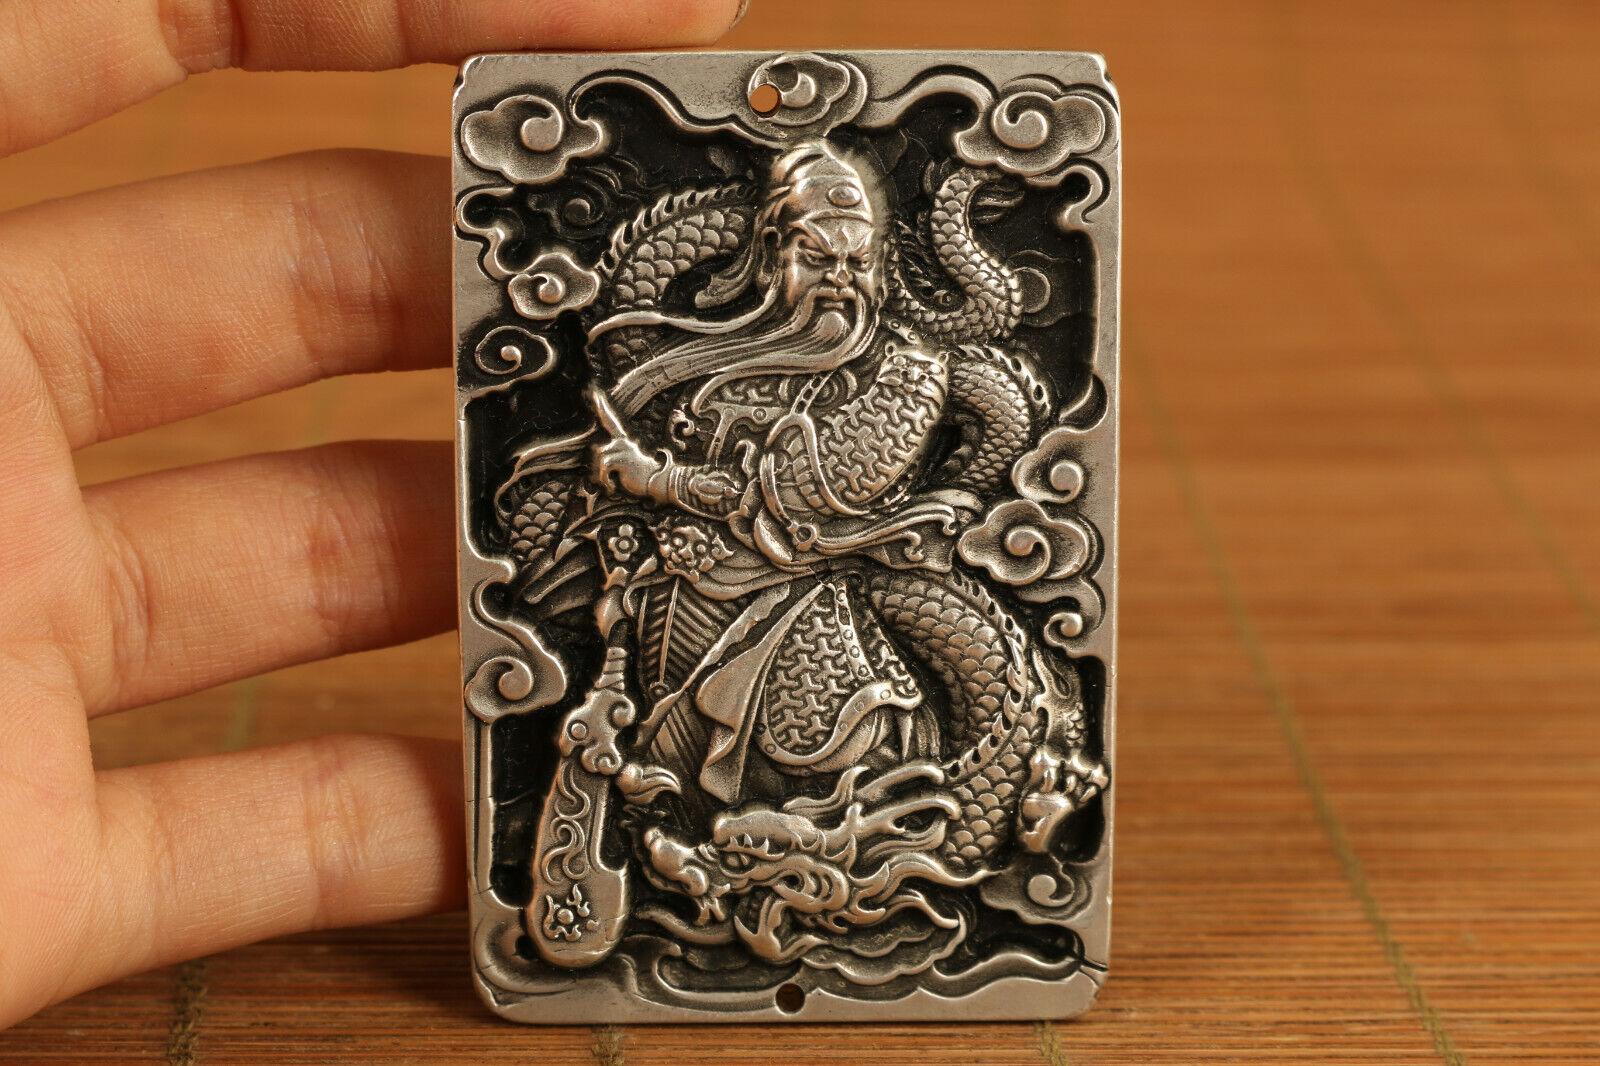 Old tibet silver hand casting love art statue netsuke pendant necklace